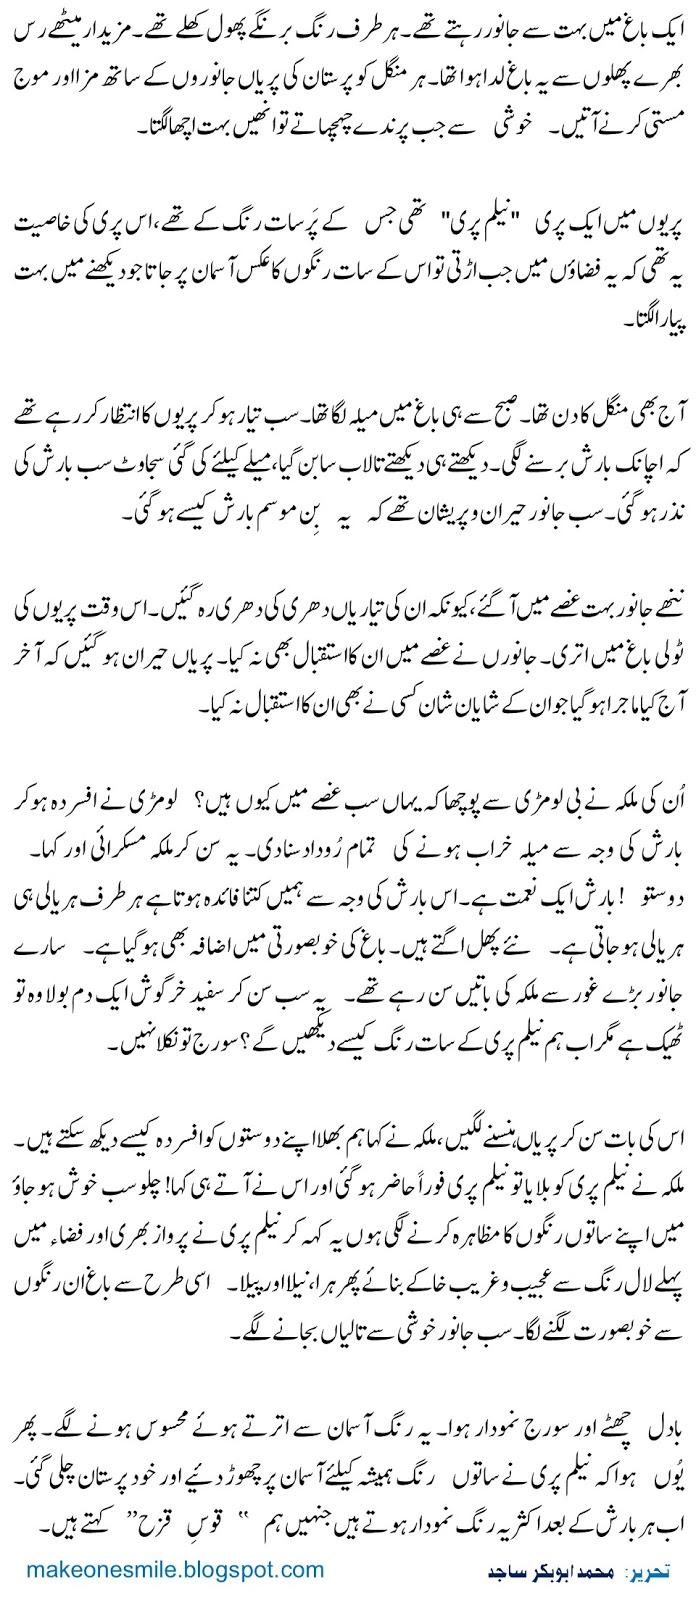 cartoon cinderella story in urdu | cartoonxcartoon com